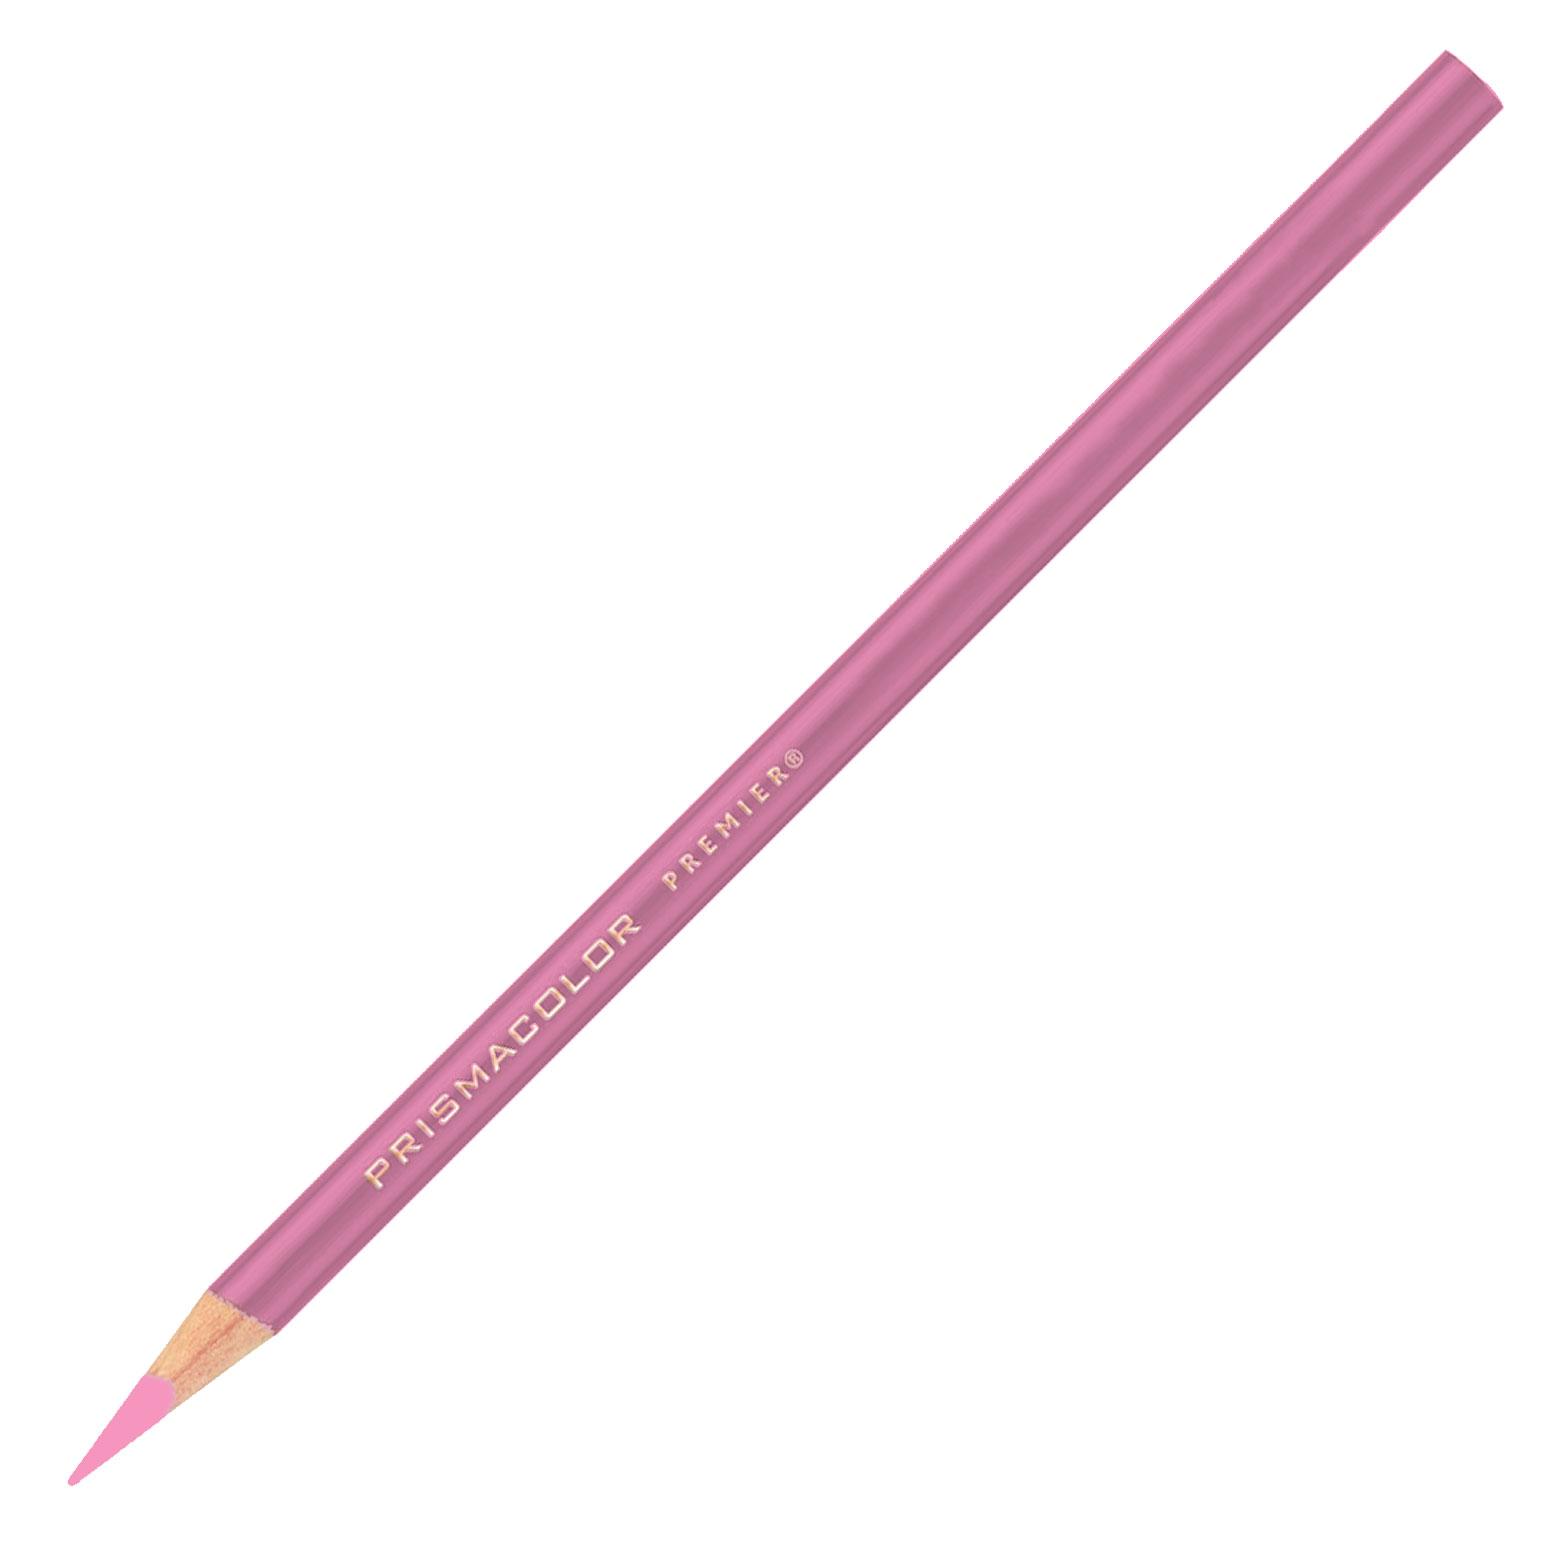 Prismacolor Pencils Deals On 1001 Blocks